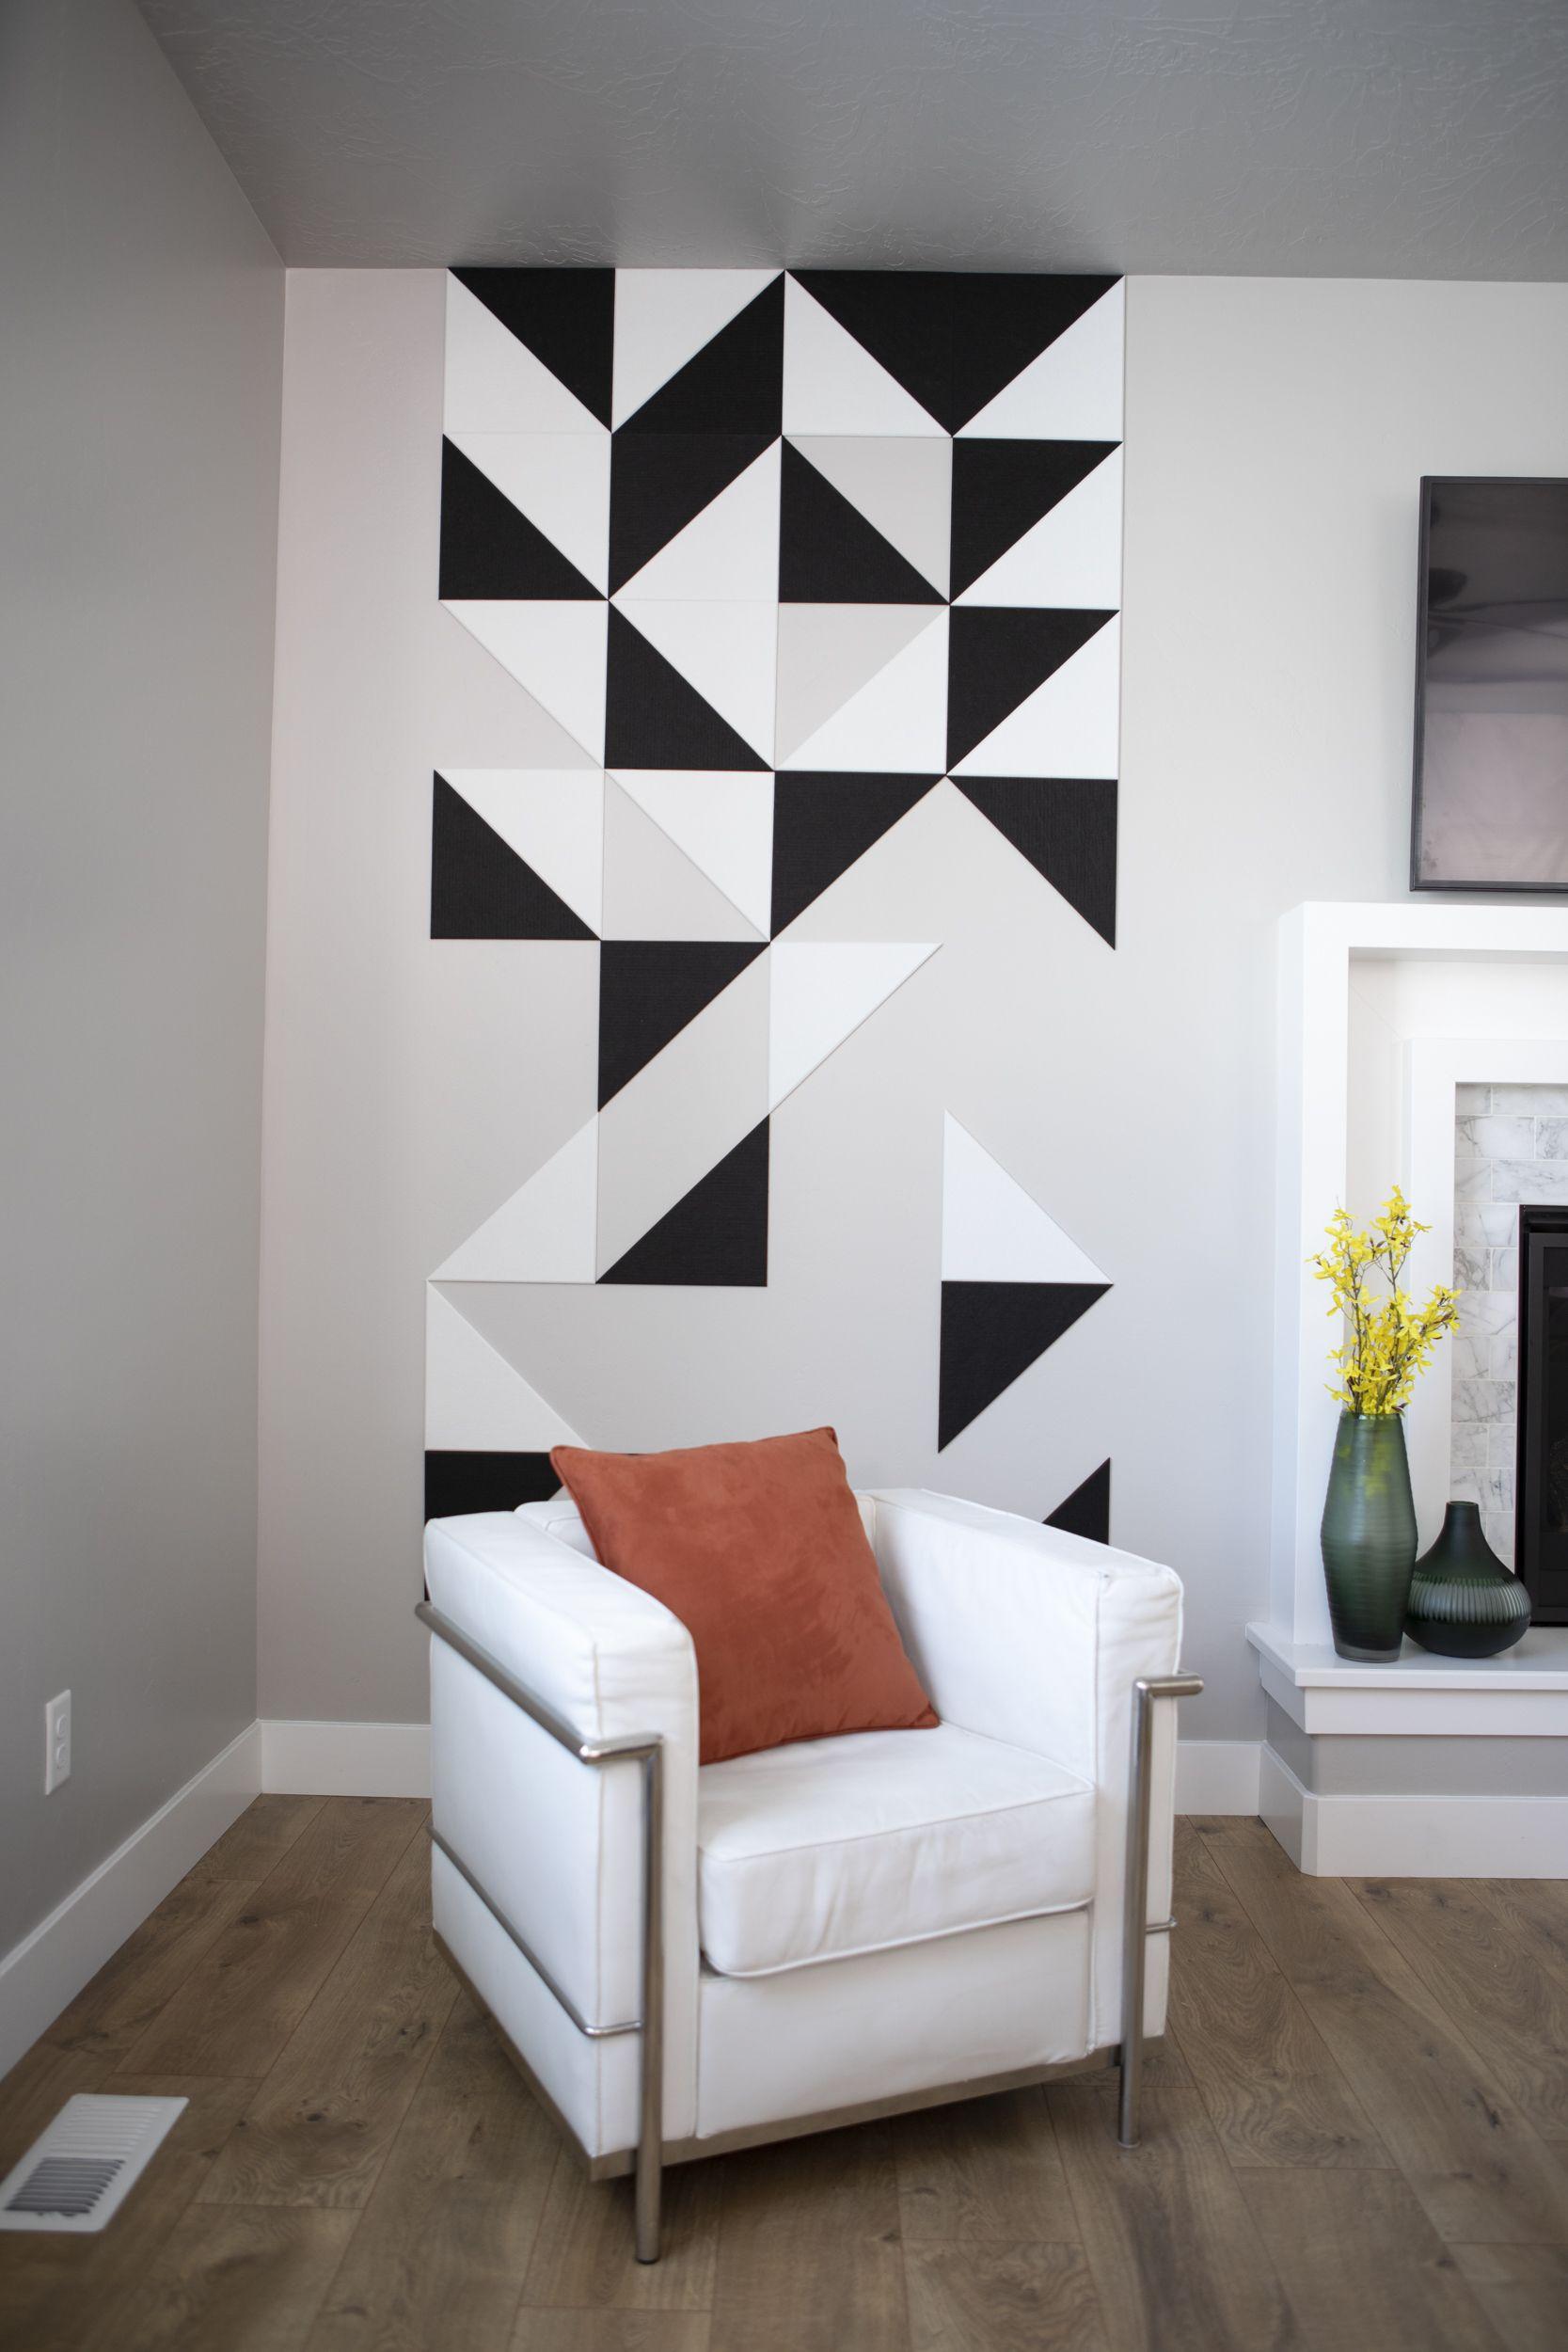 Geometric Triangle Art | Commercial interior design, Wall ...